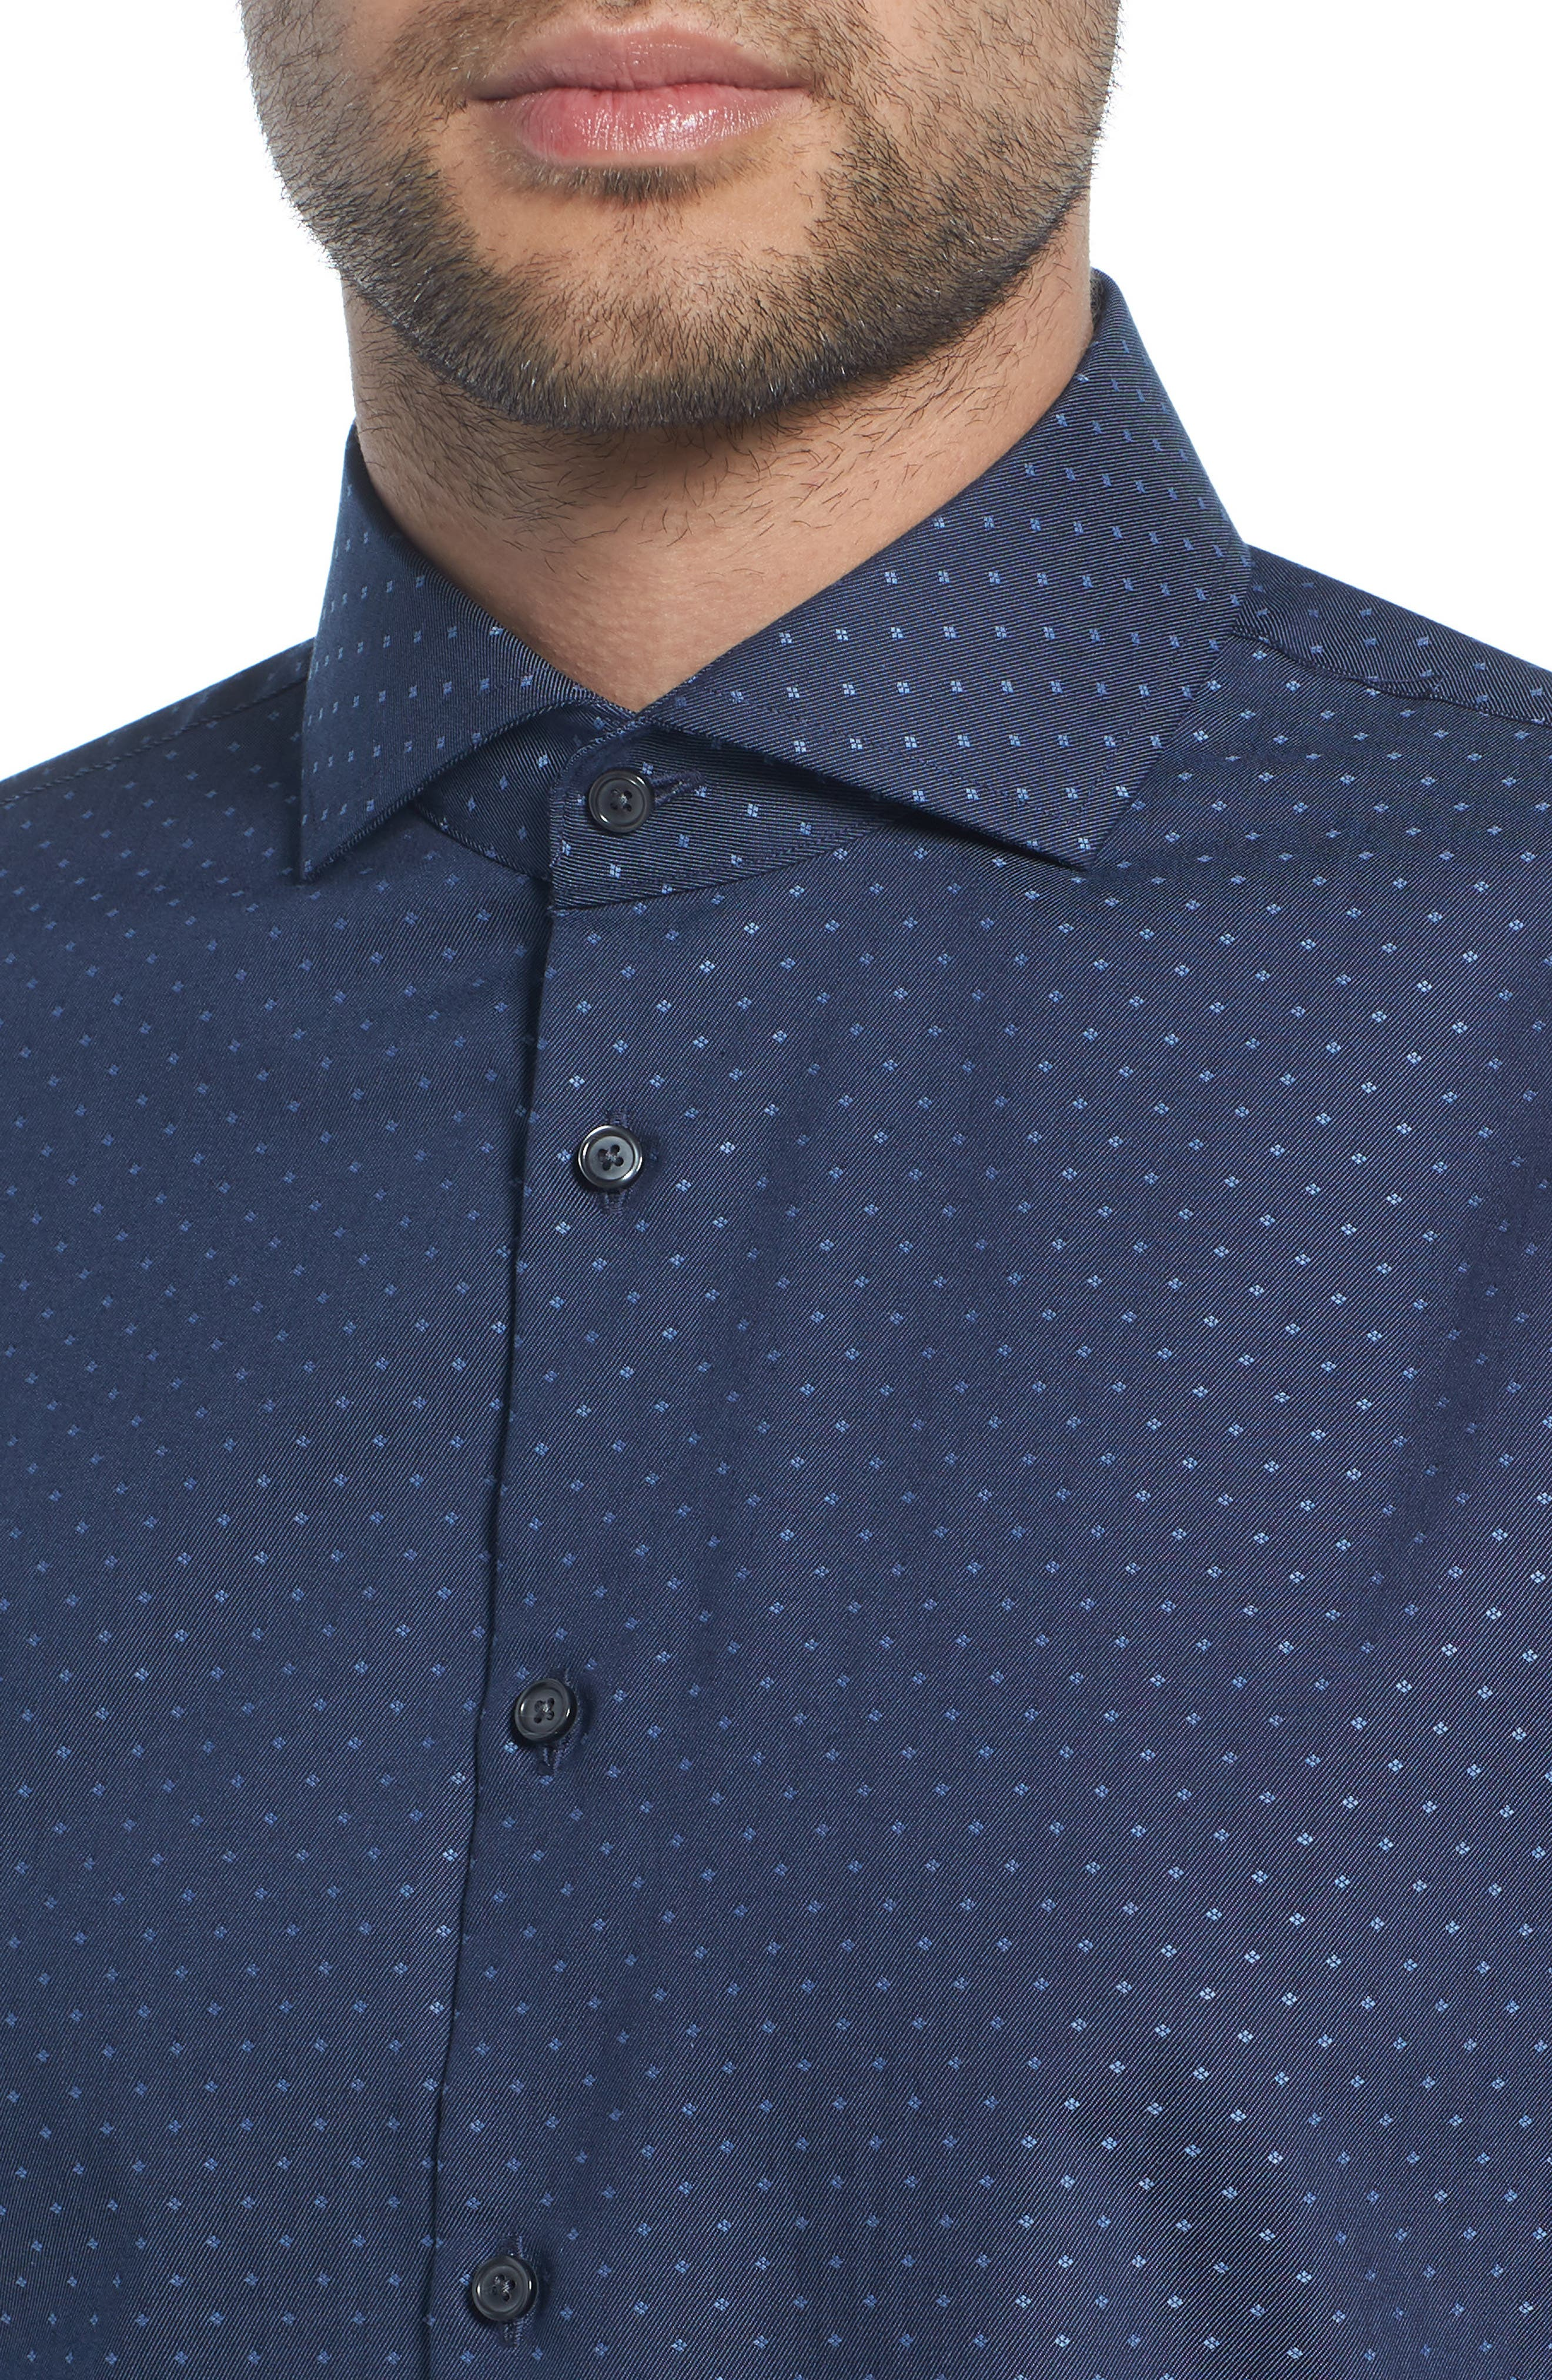 Extra Trim Fit Dot Dress Shirt,                             Alternate thumbnail 2, color,                             410